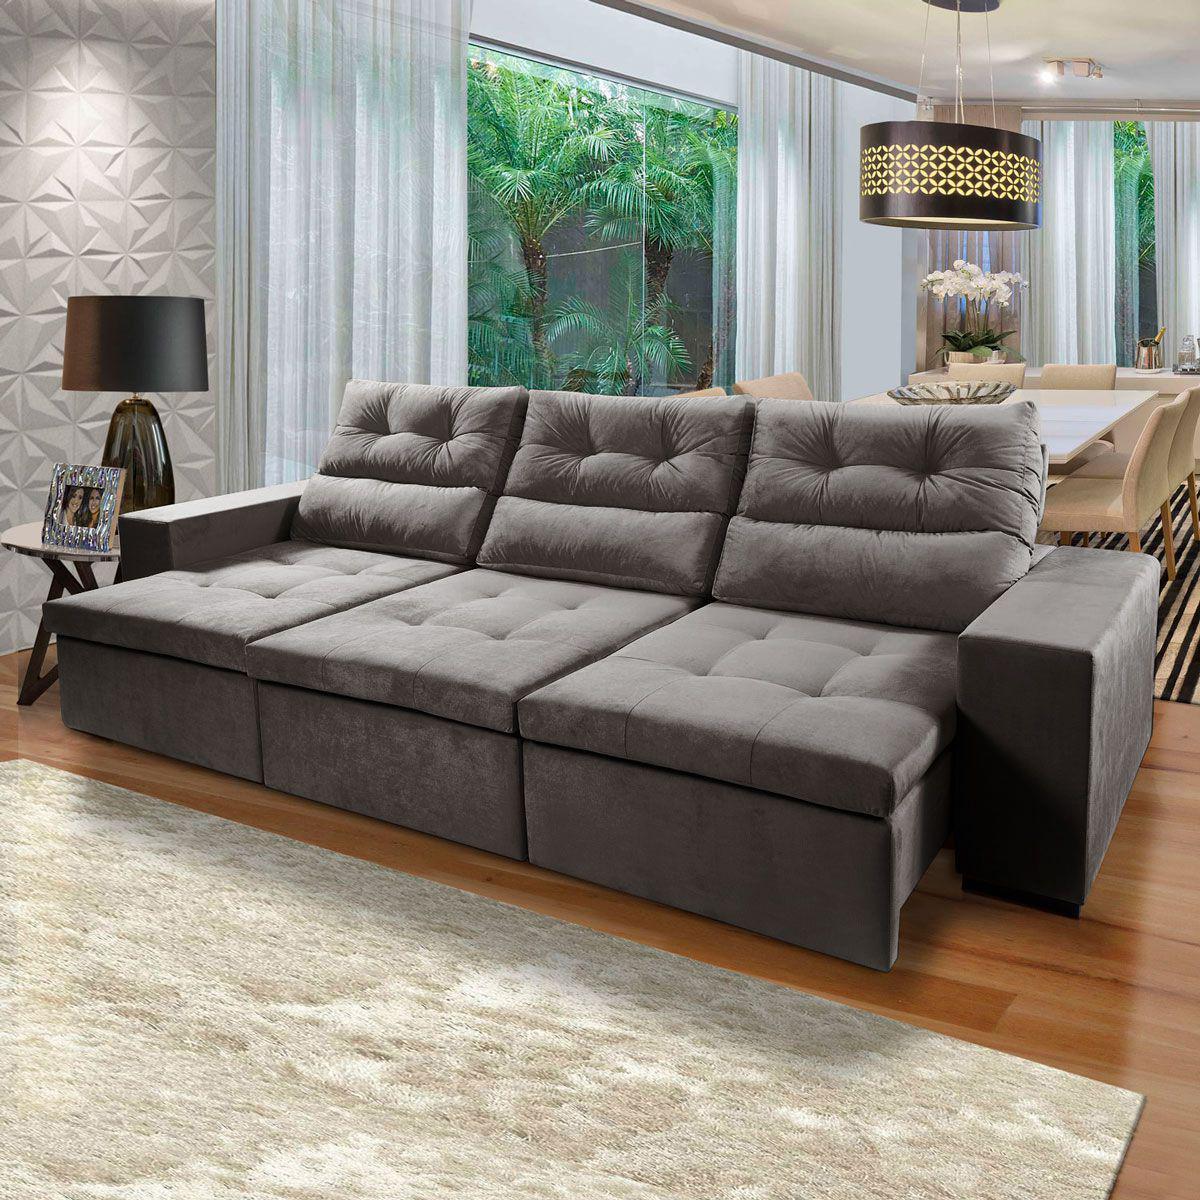 Sofa 6 Lugares Vic 320 Cm Retratil Reclinavel Pillow Veludo Cinza Escuro Duvali Sofas Magazine Luiza